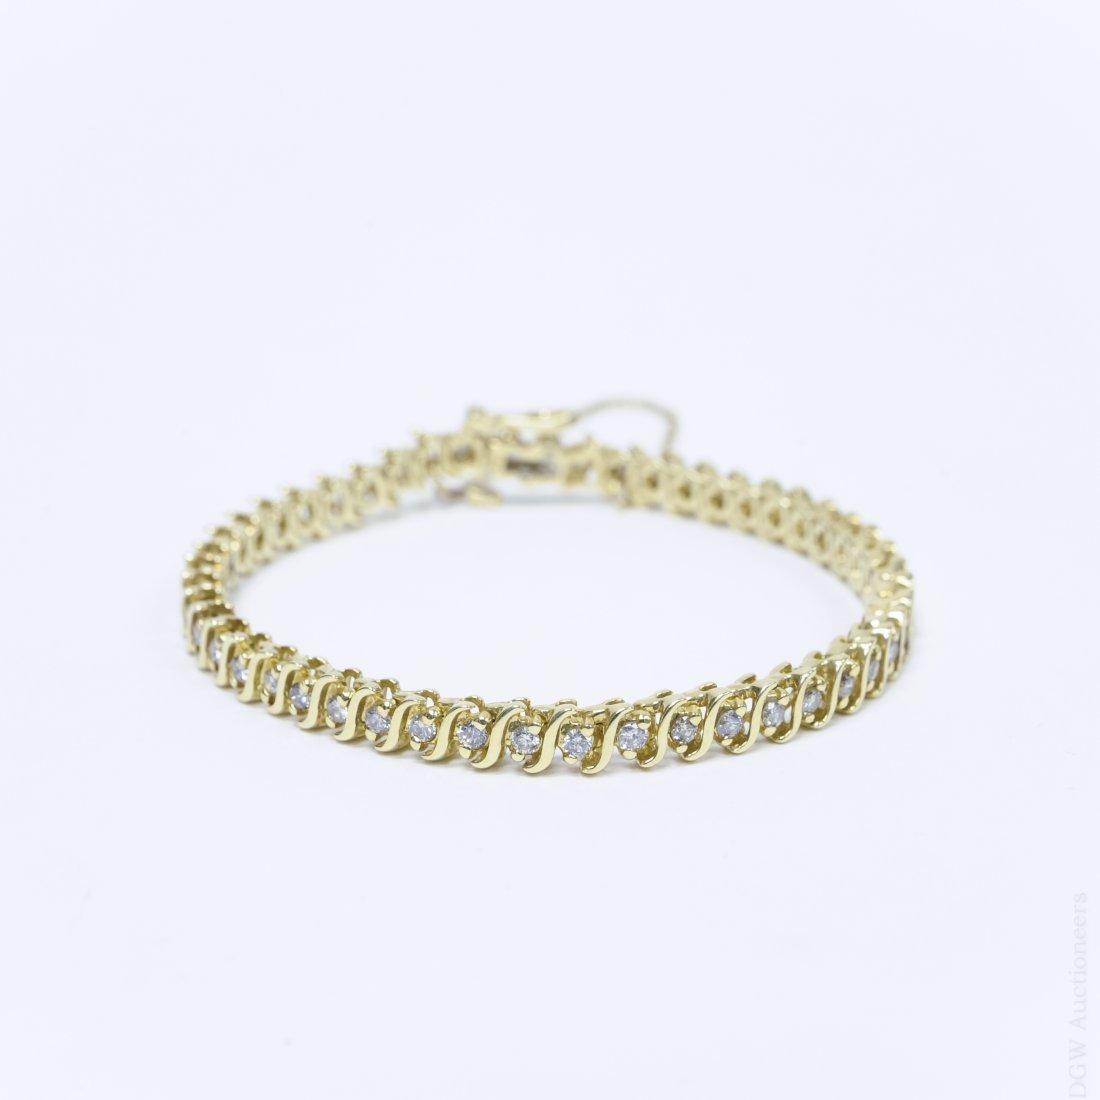 14K Yellow Gold and Diamond Tennis Bracelet.